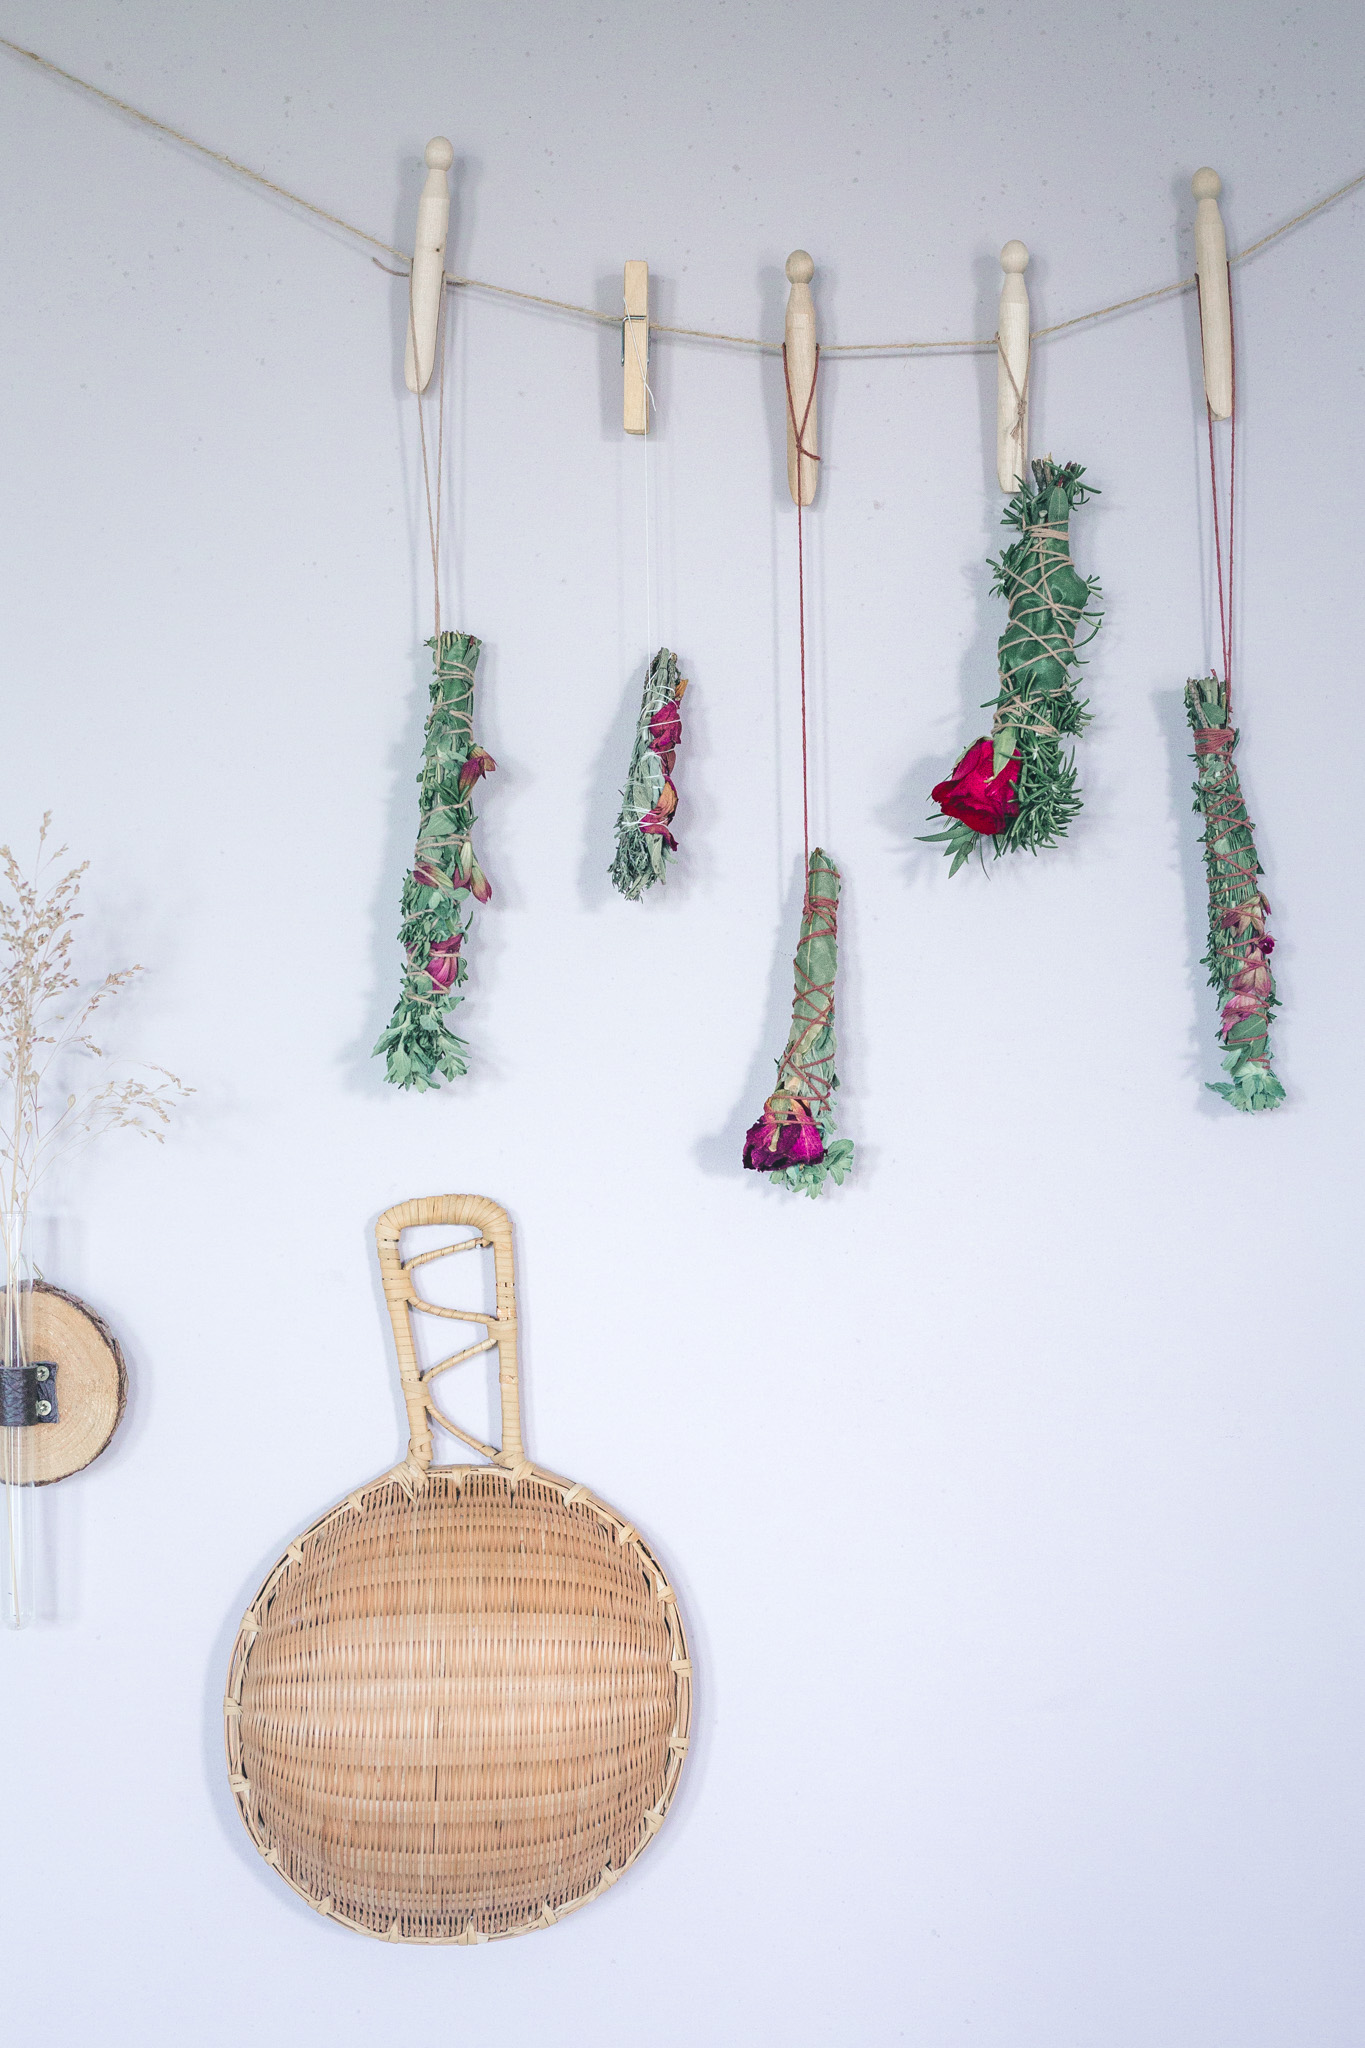 DIY: Smudge Sticks за начинаещи или как да пречистим пространстовото около нас.